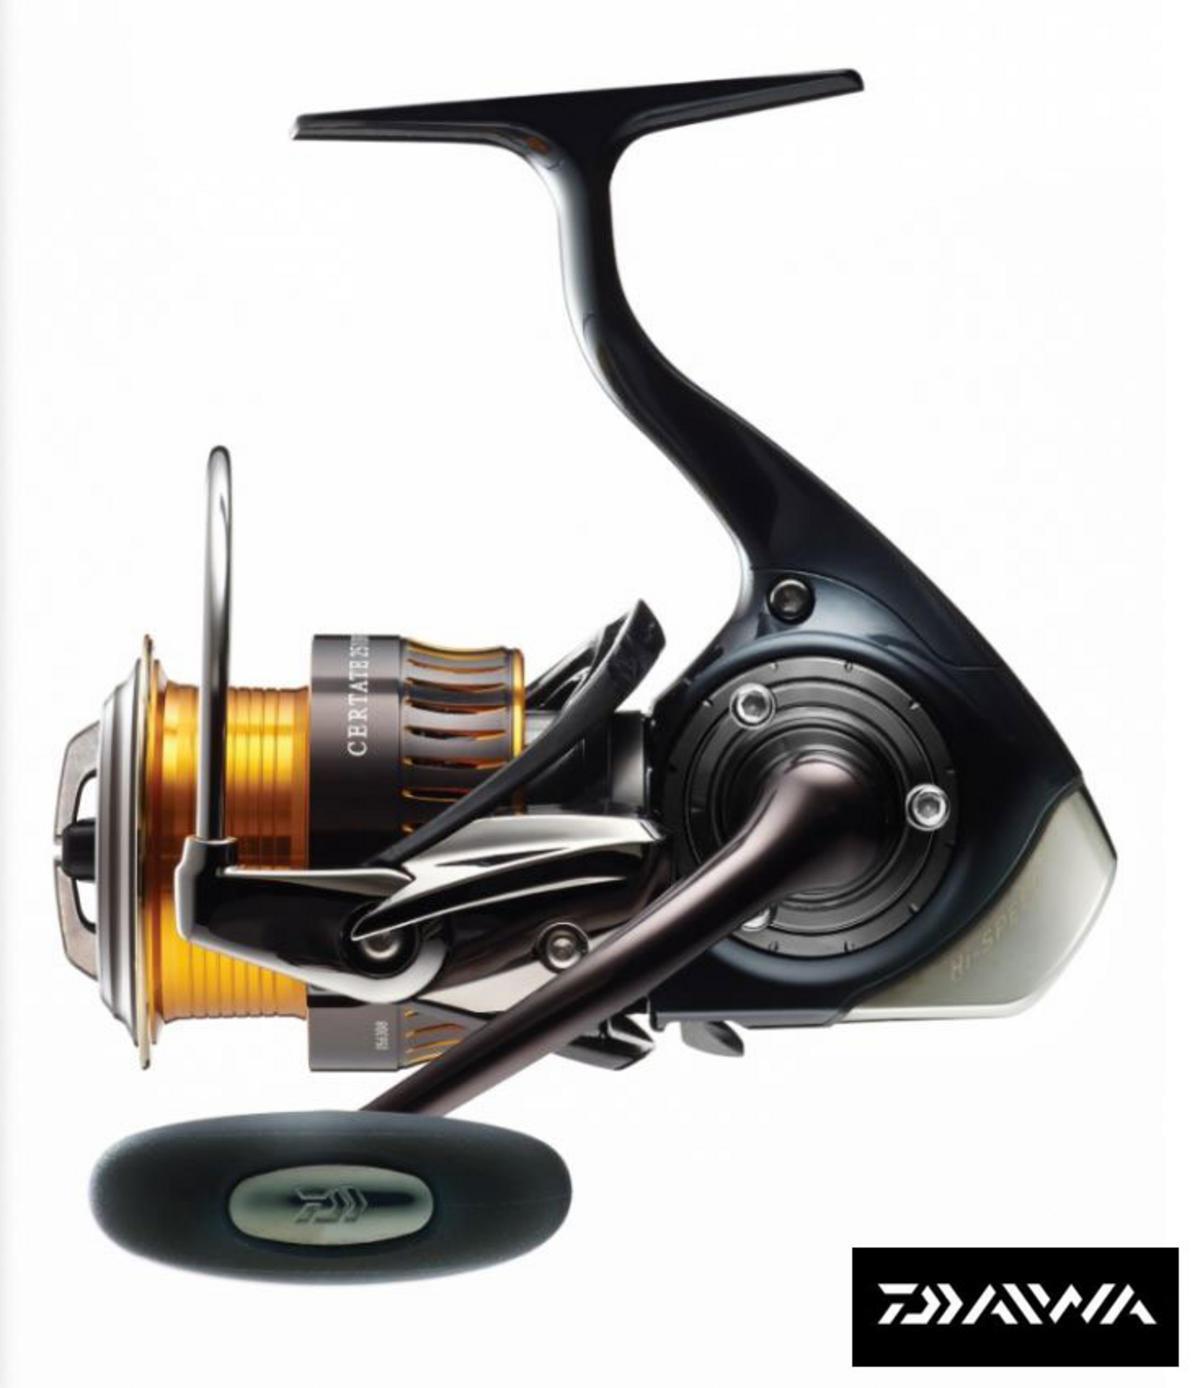 New Daiwa 16 Certate 3012 Spinning Reel Model No. 16Certate 3012